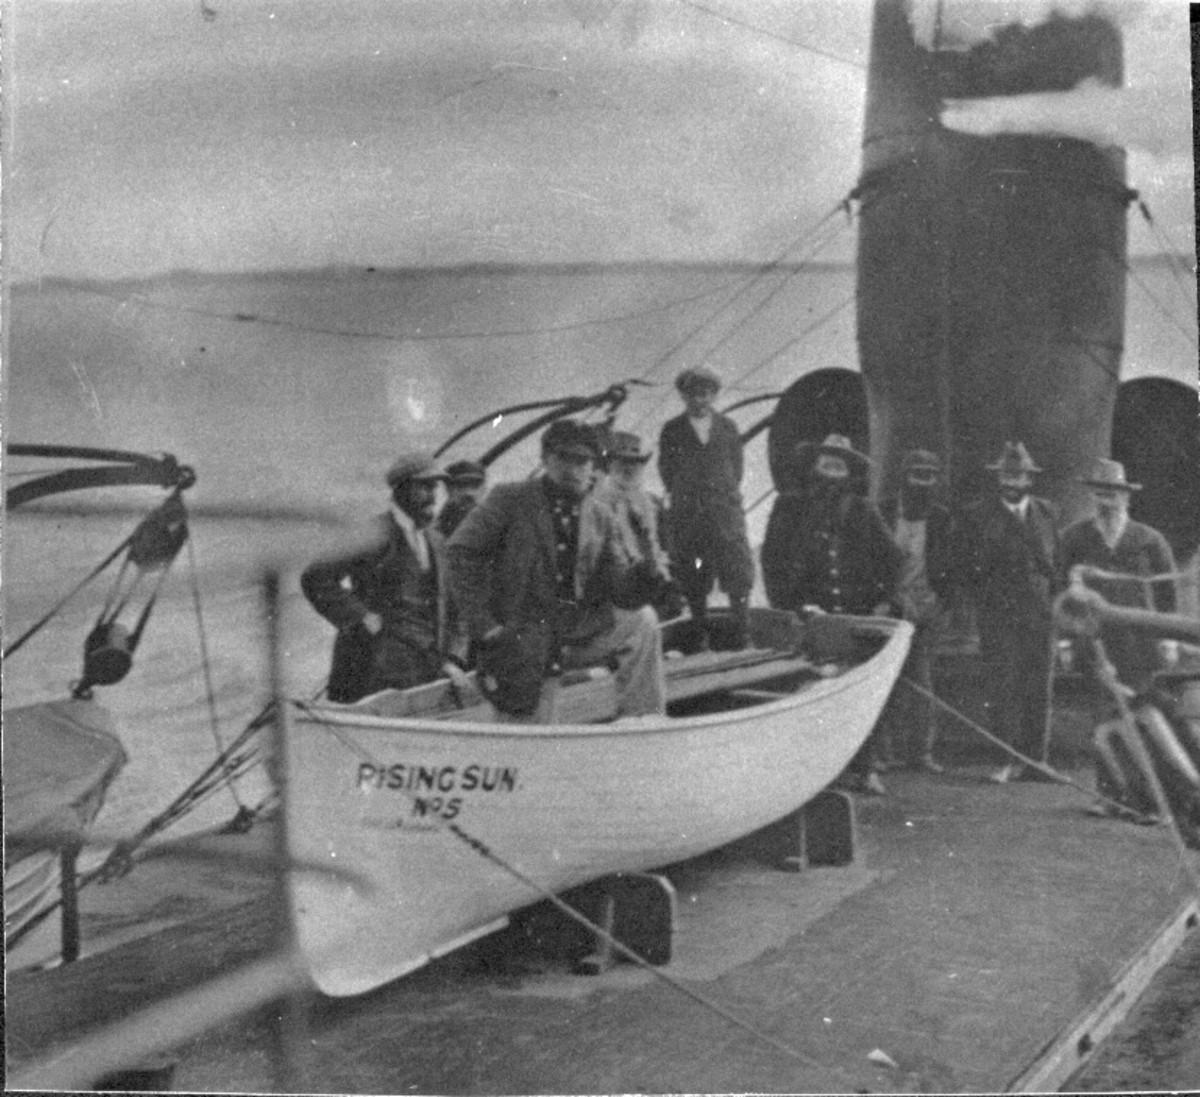 The crew aboard the Rising Sun.